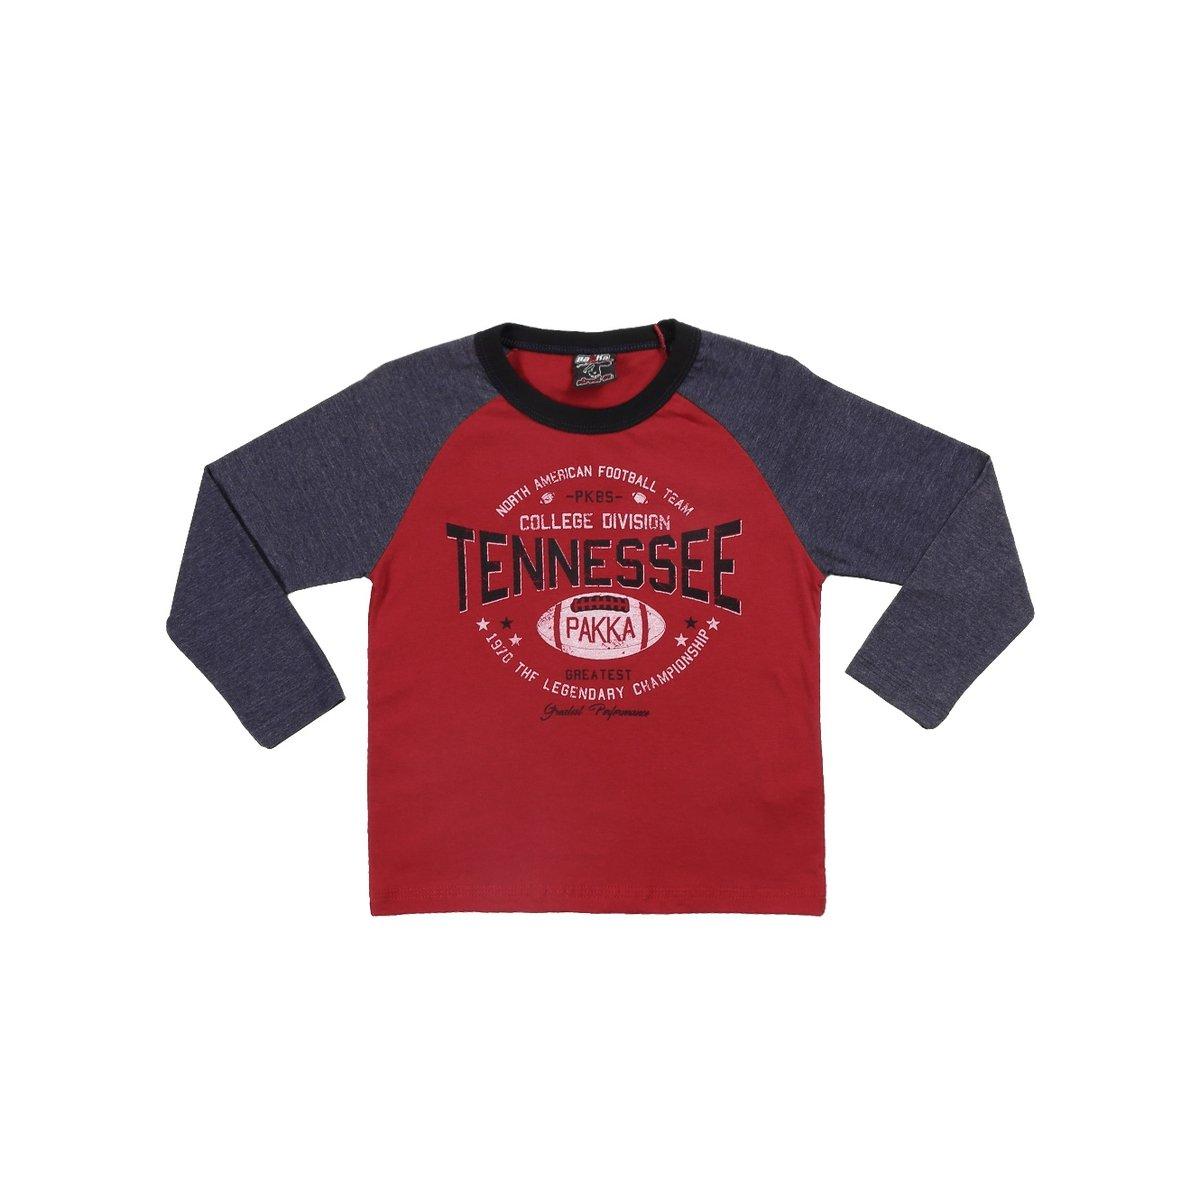 Camiseta Manga Longa Infantil Pakka Boys Masculino - Compre Agora ... 3068e35c84